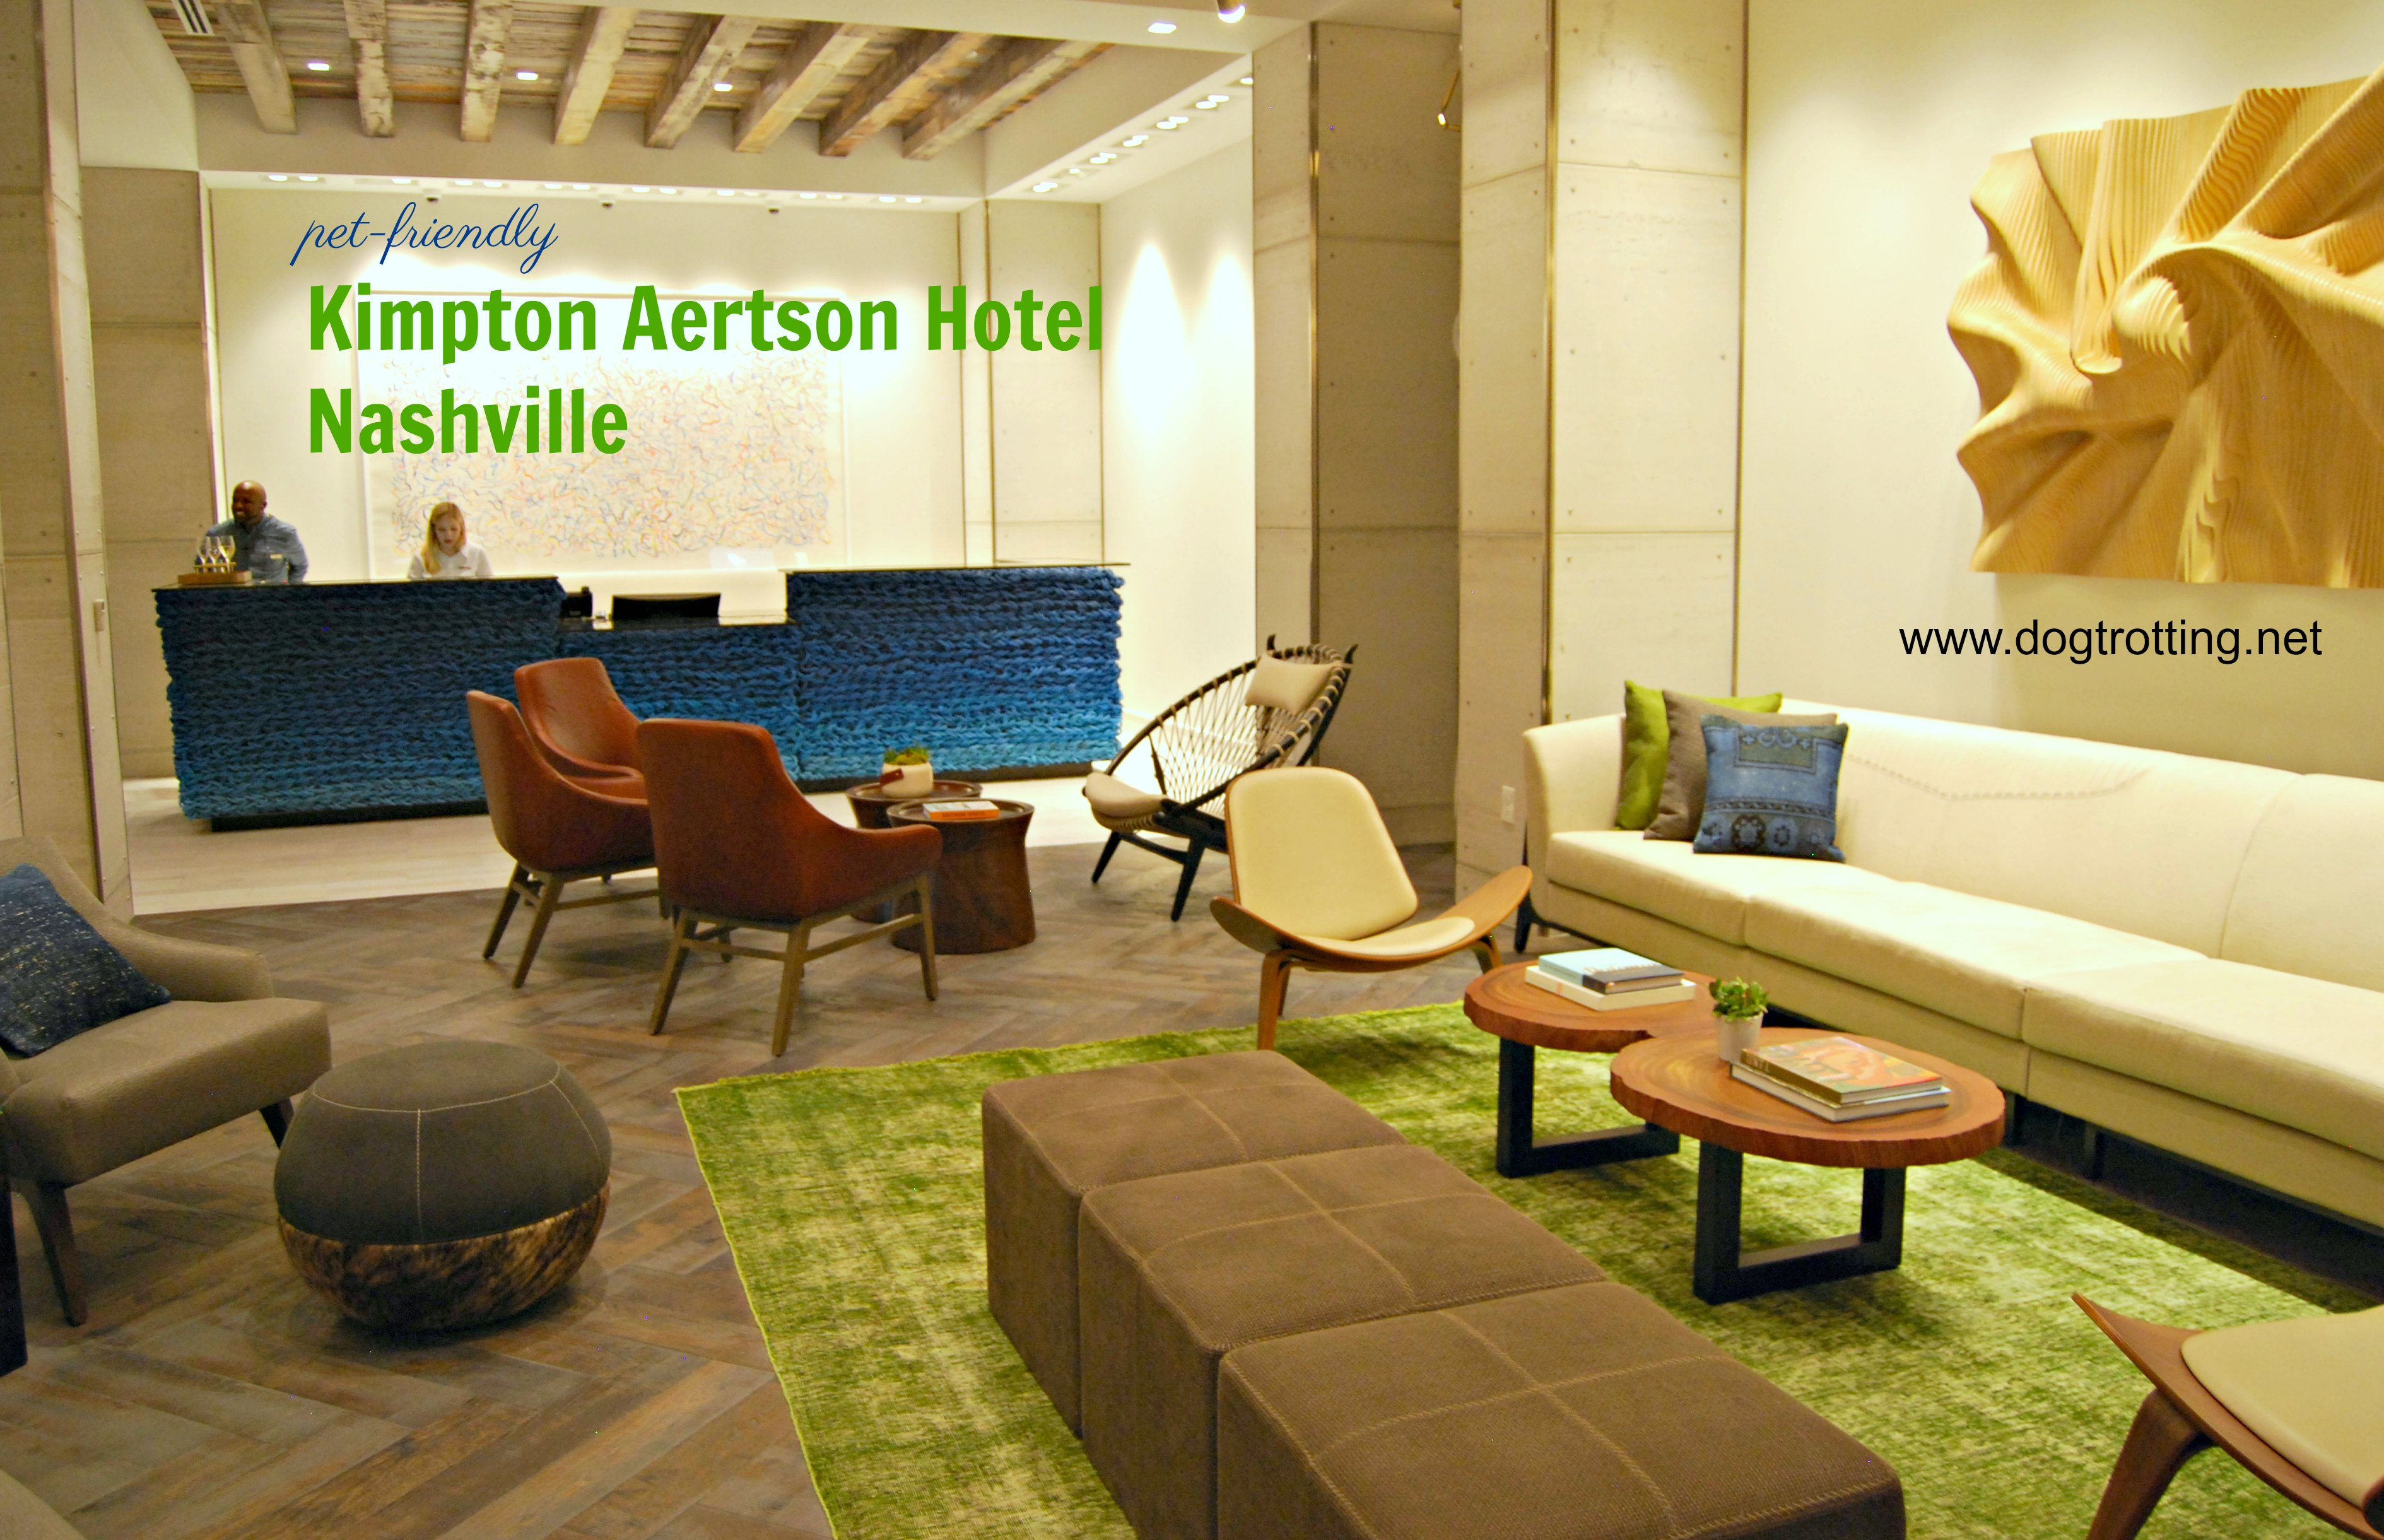 Lobby of the Kimpton Aertson Hotel, Nashville